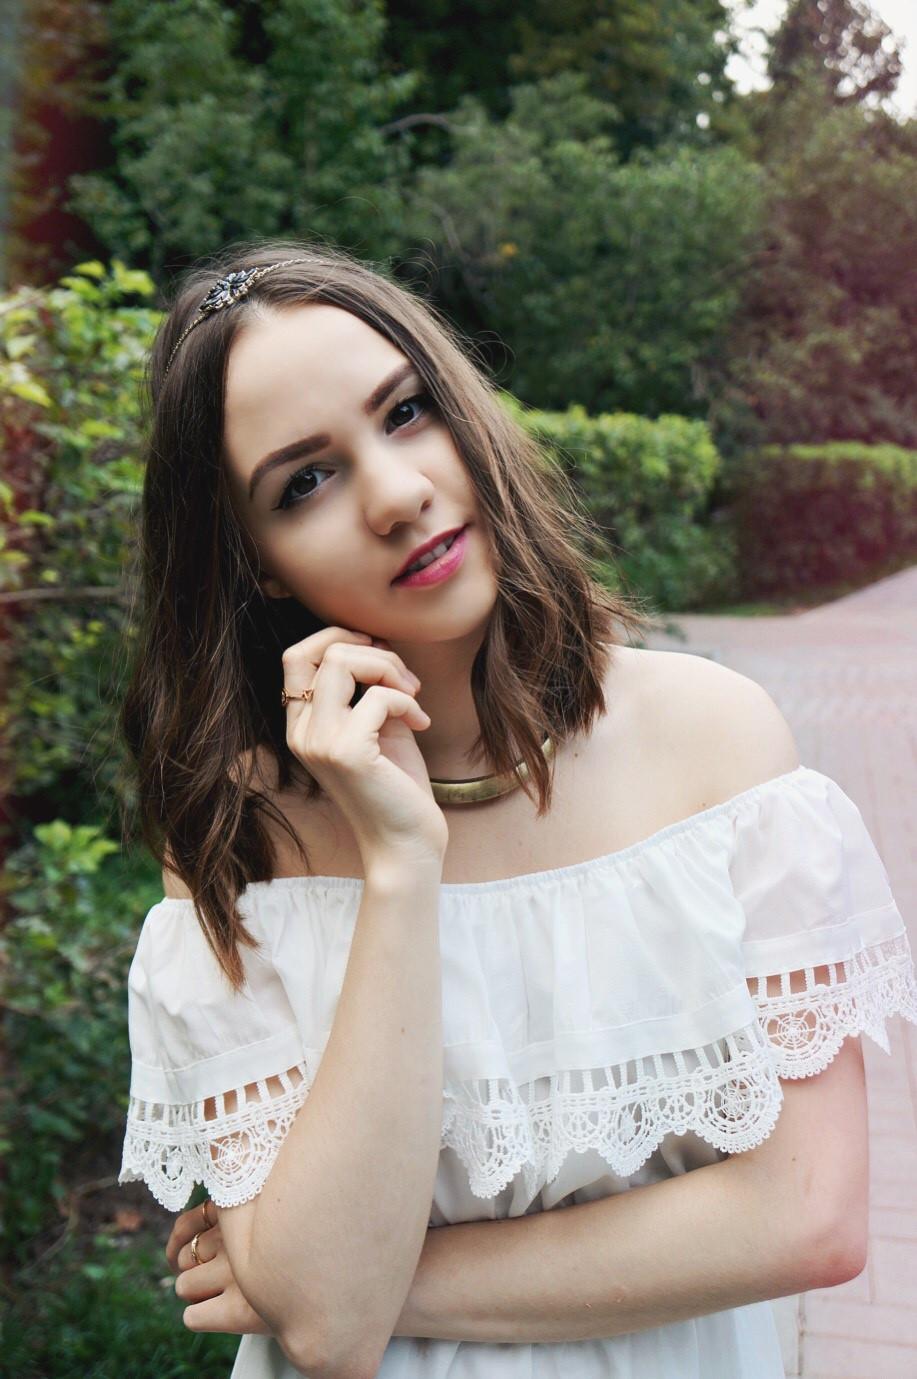 alina ermilova, fashion blogger